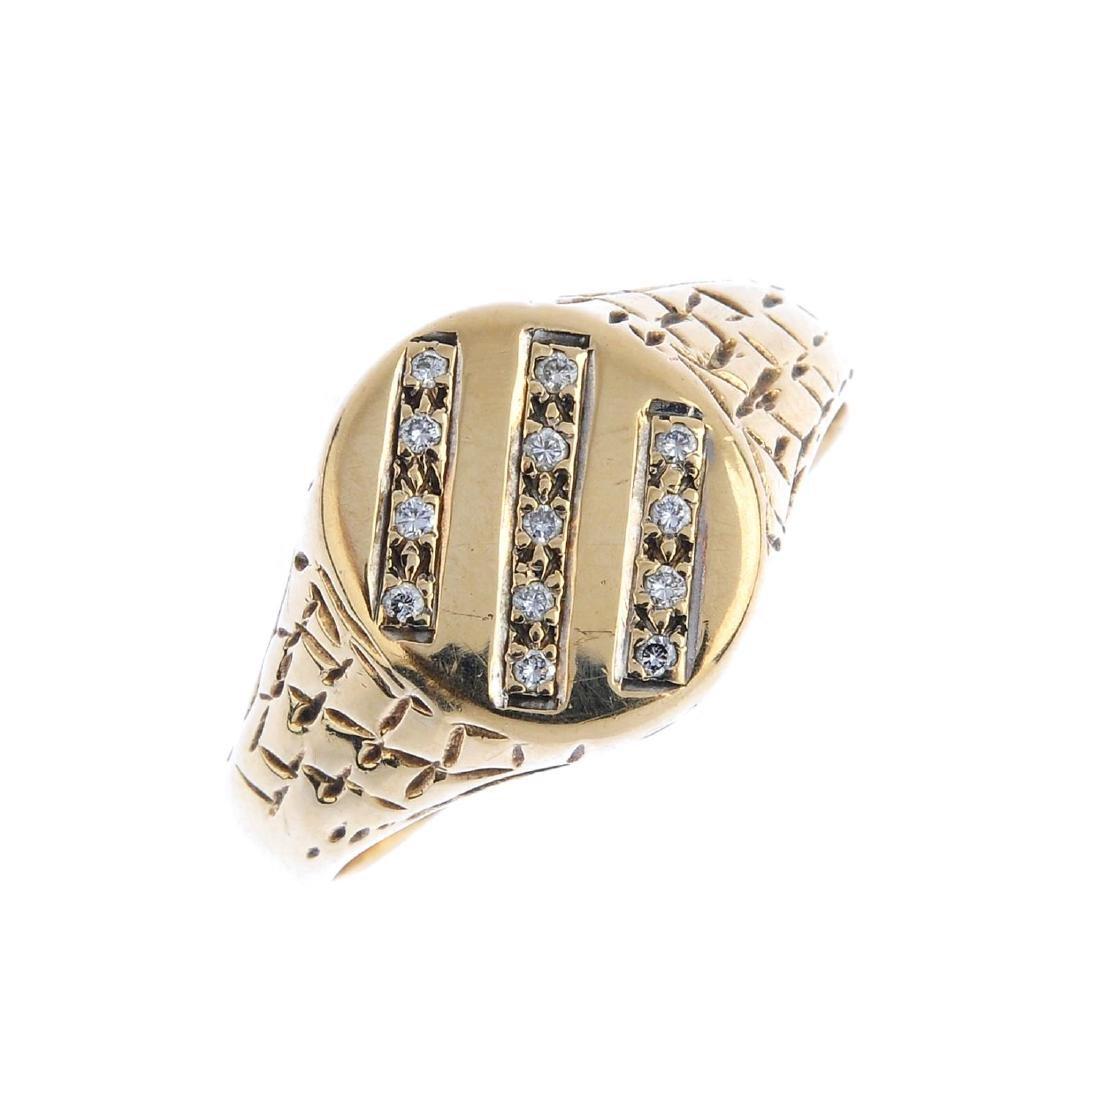 A gentleman's 9ct gold diamond signet ring. The